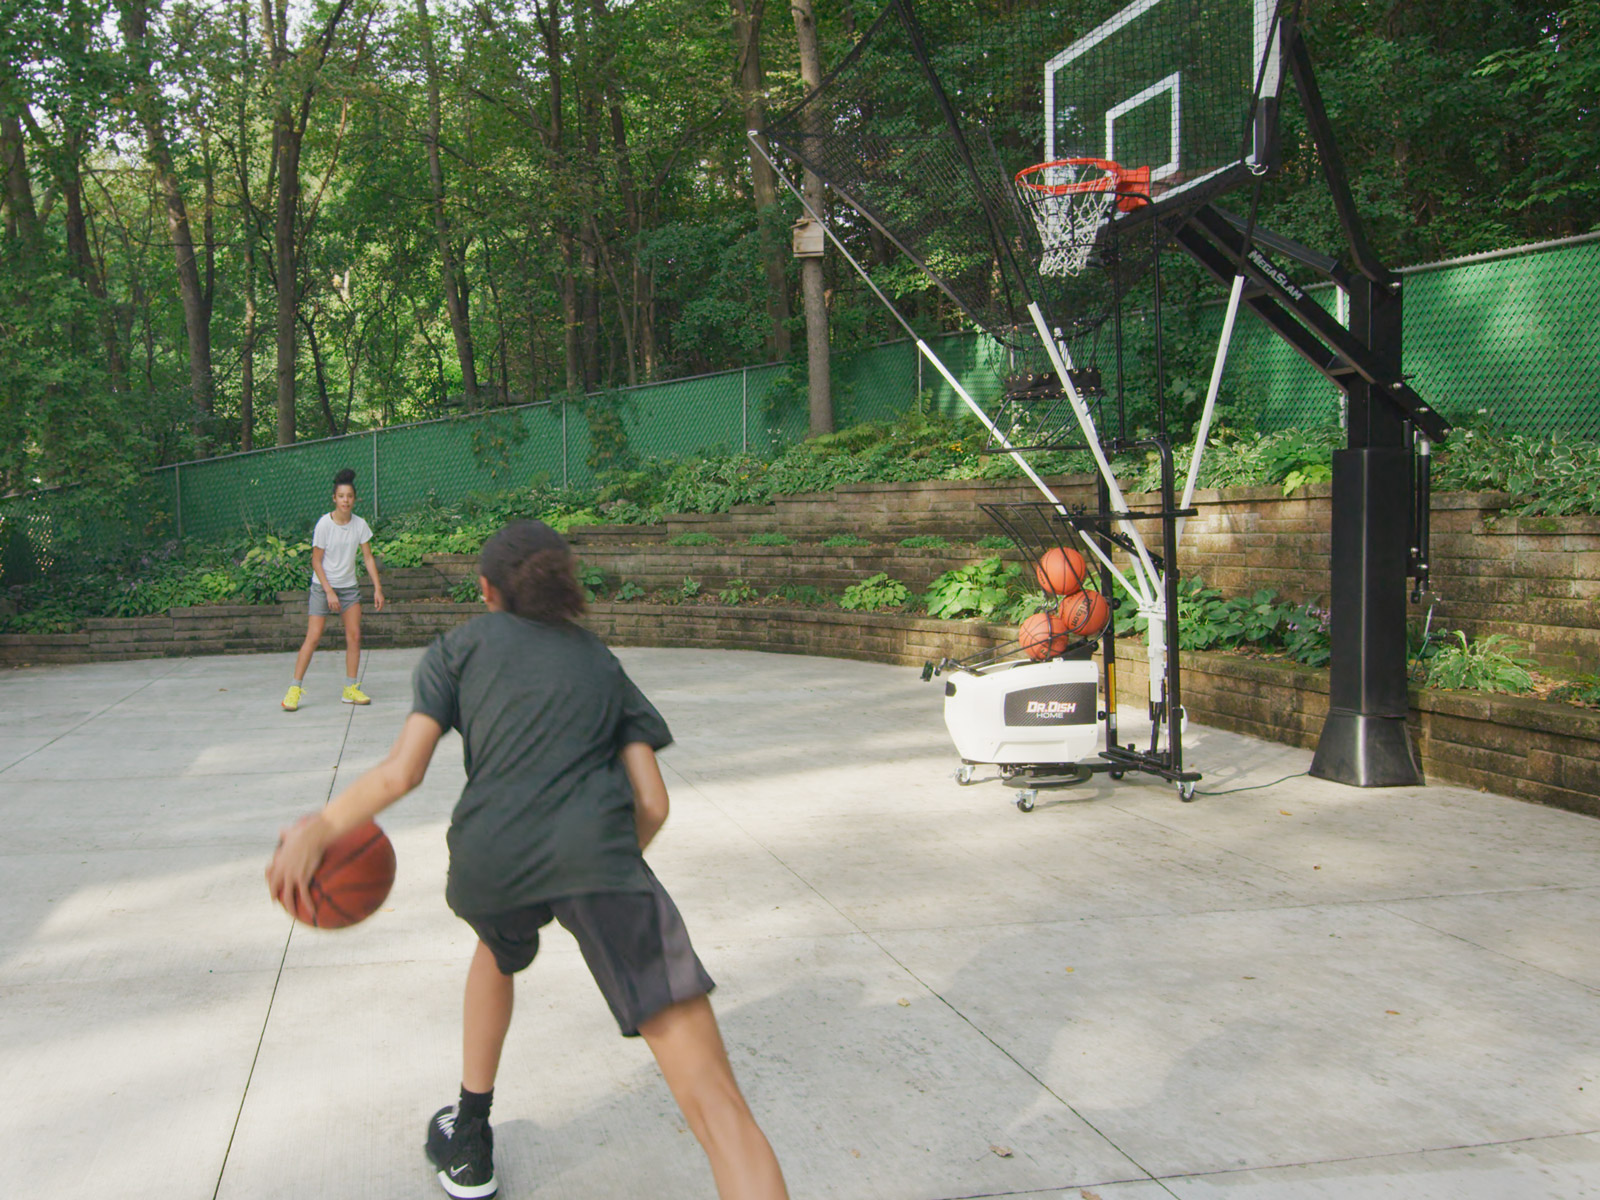 Basketball Training: Practice Versus Skill Development